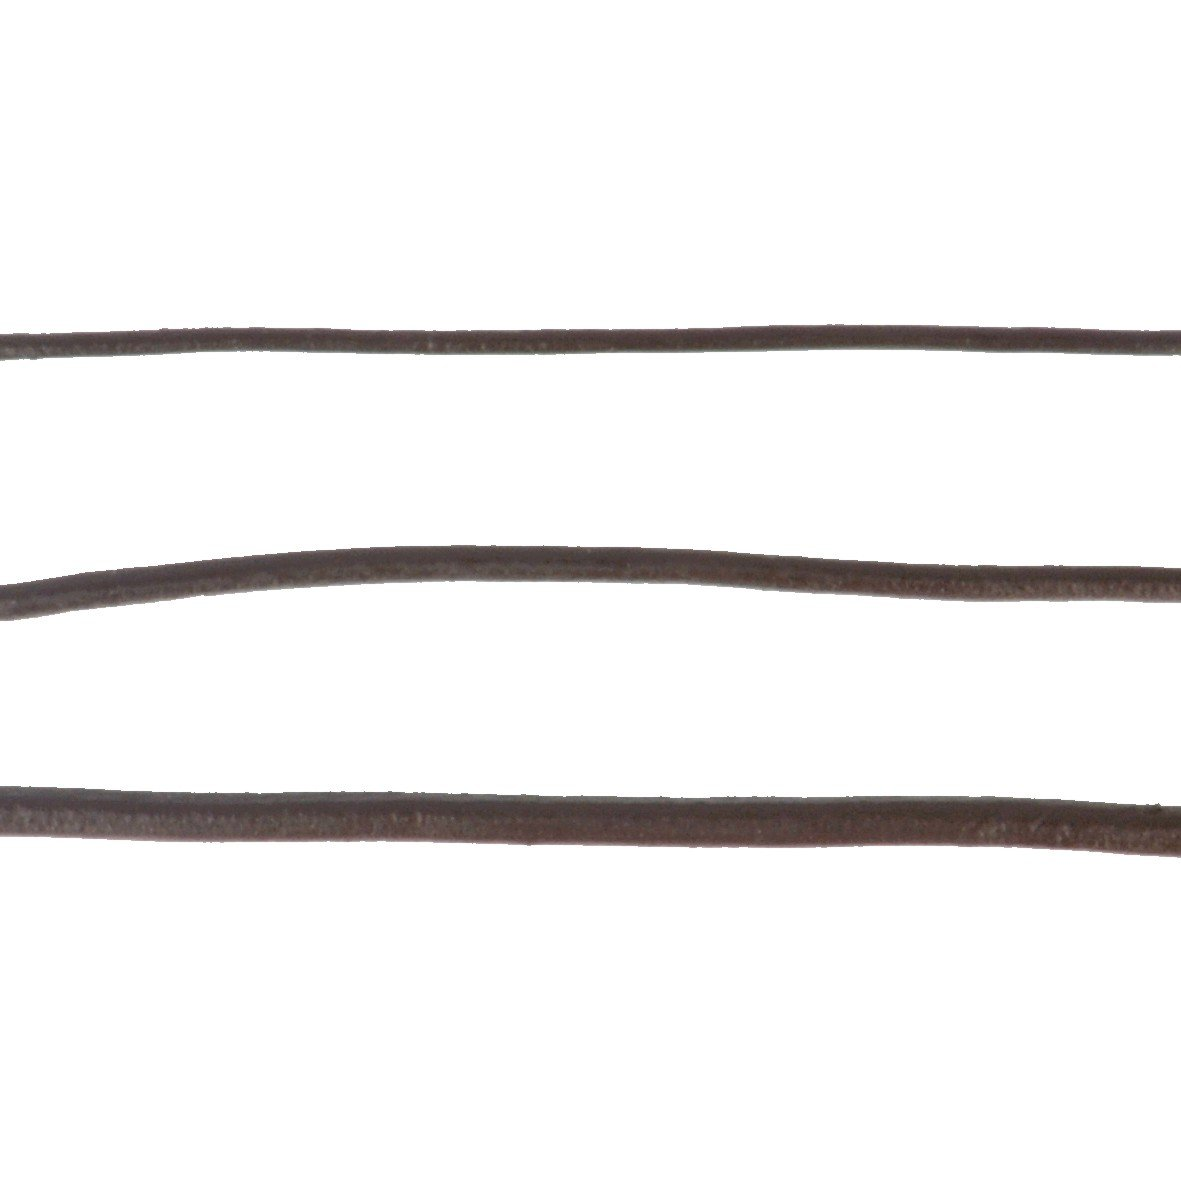 Black Leather Cording 1/4